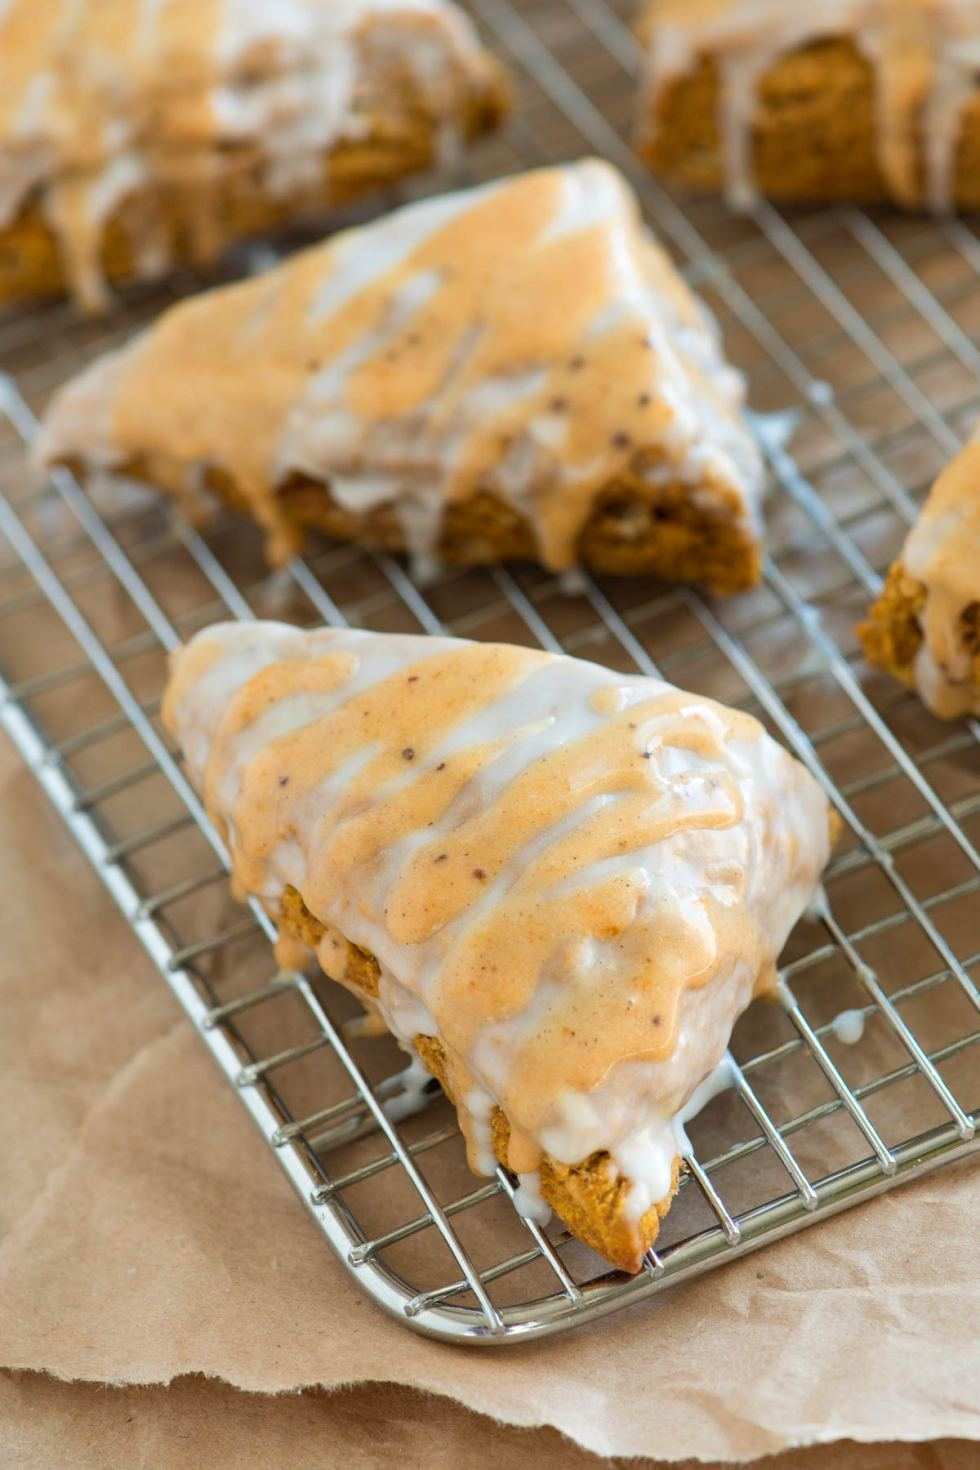 5 Pumpkin Spice Recipes You Haven't Tried Yet - Pumpkin Spice Scones